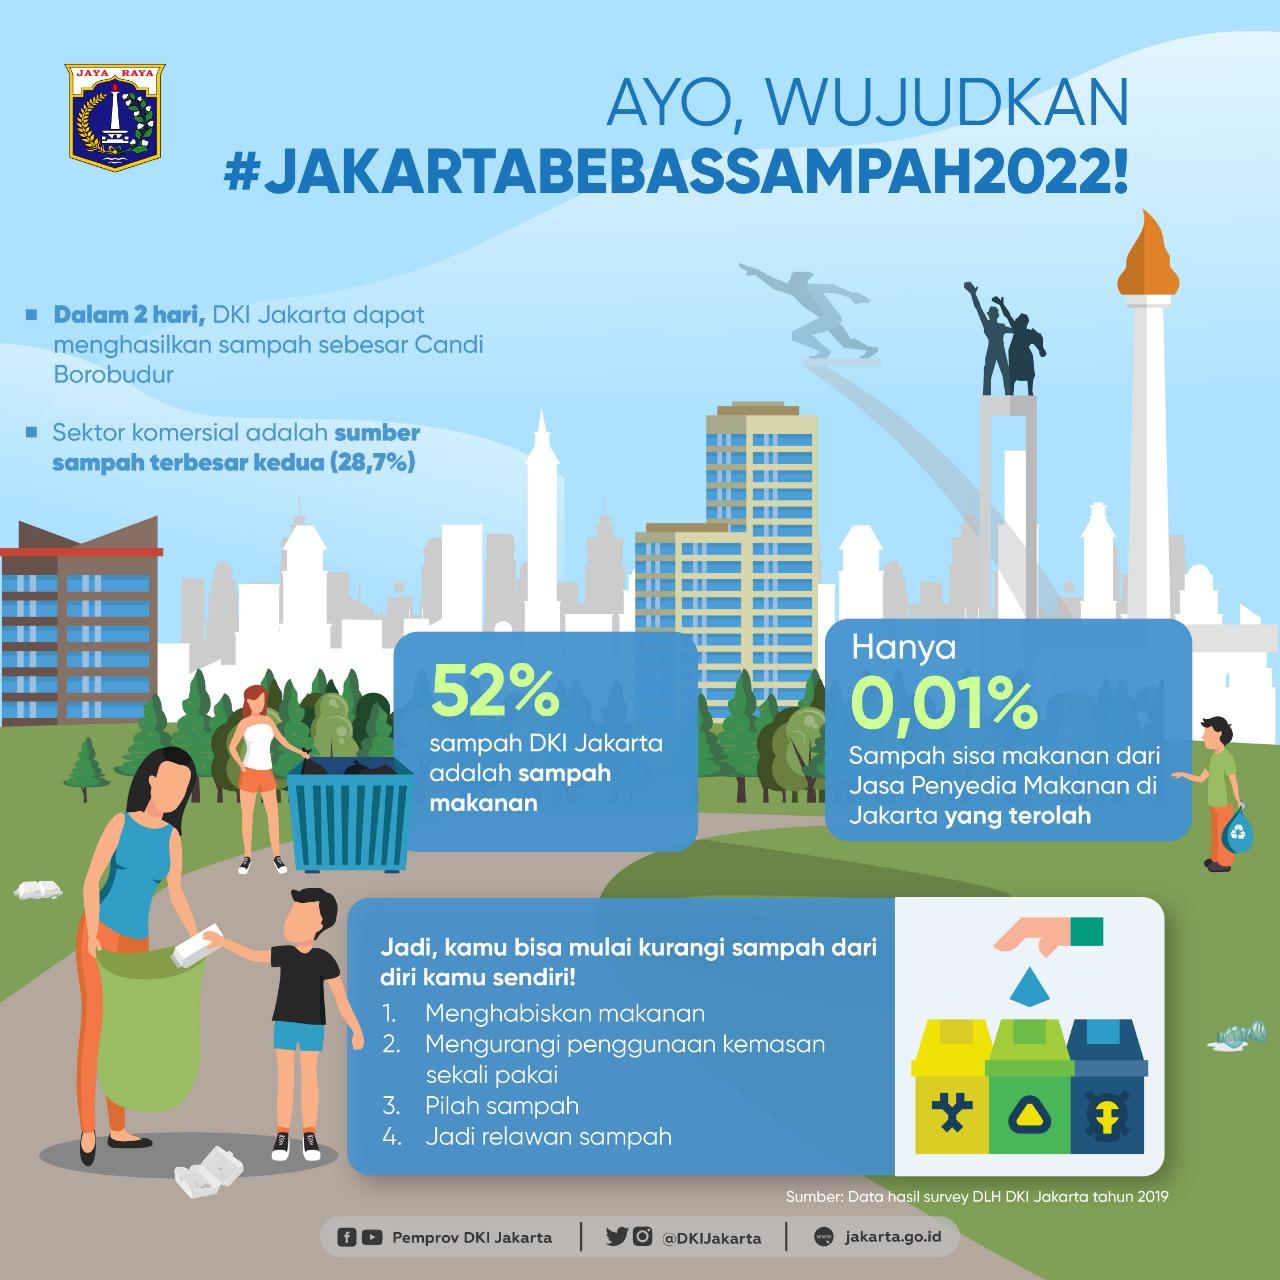 Wujudkan Jakarta Bebas Sampah 2022 -